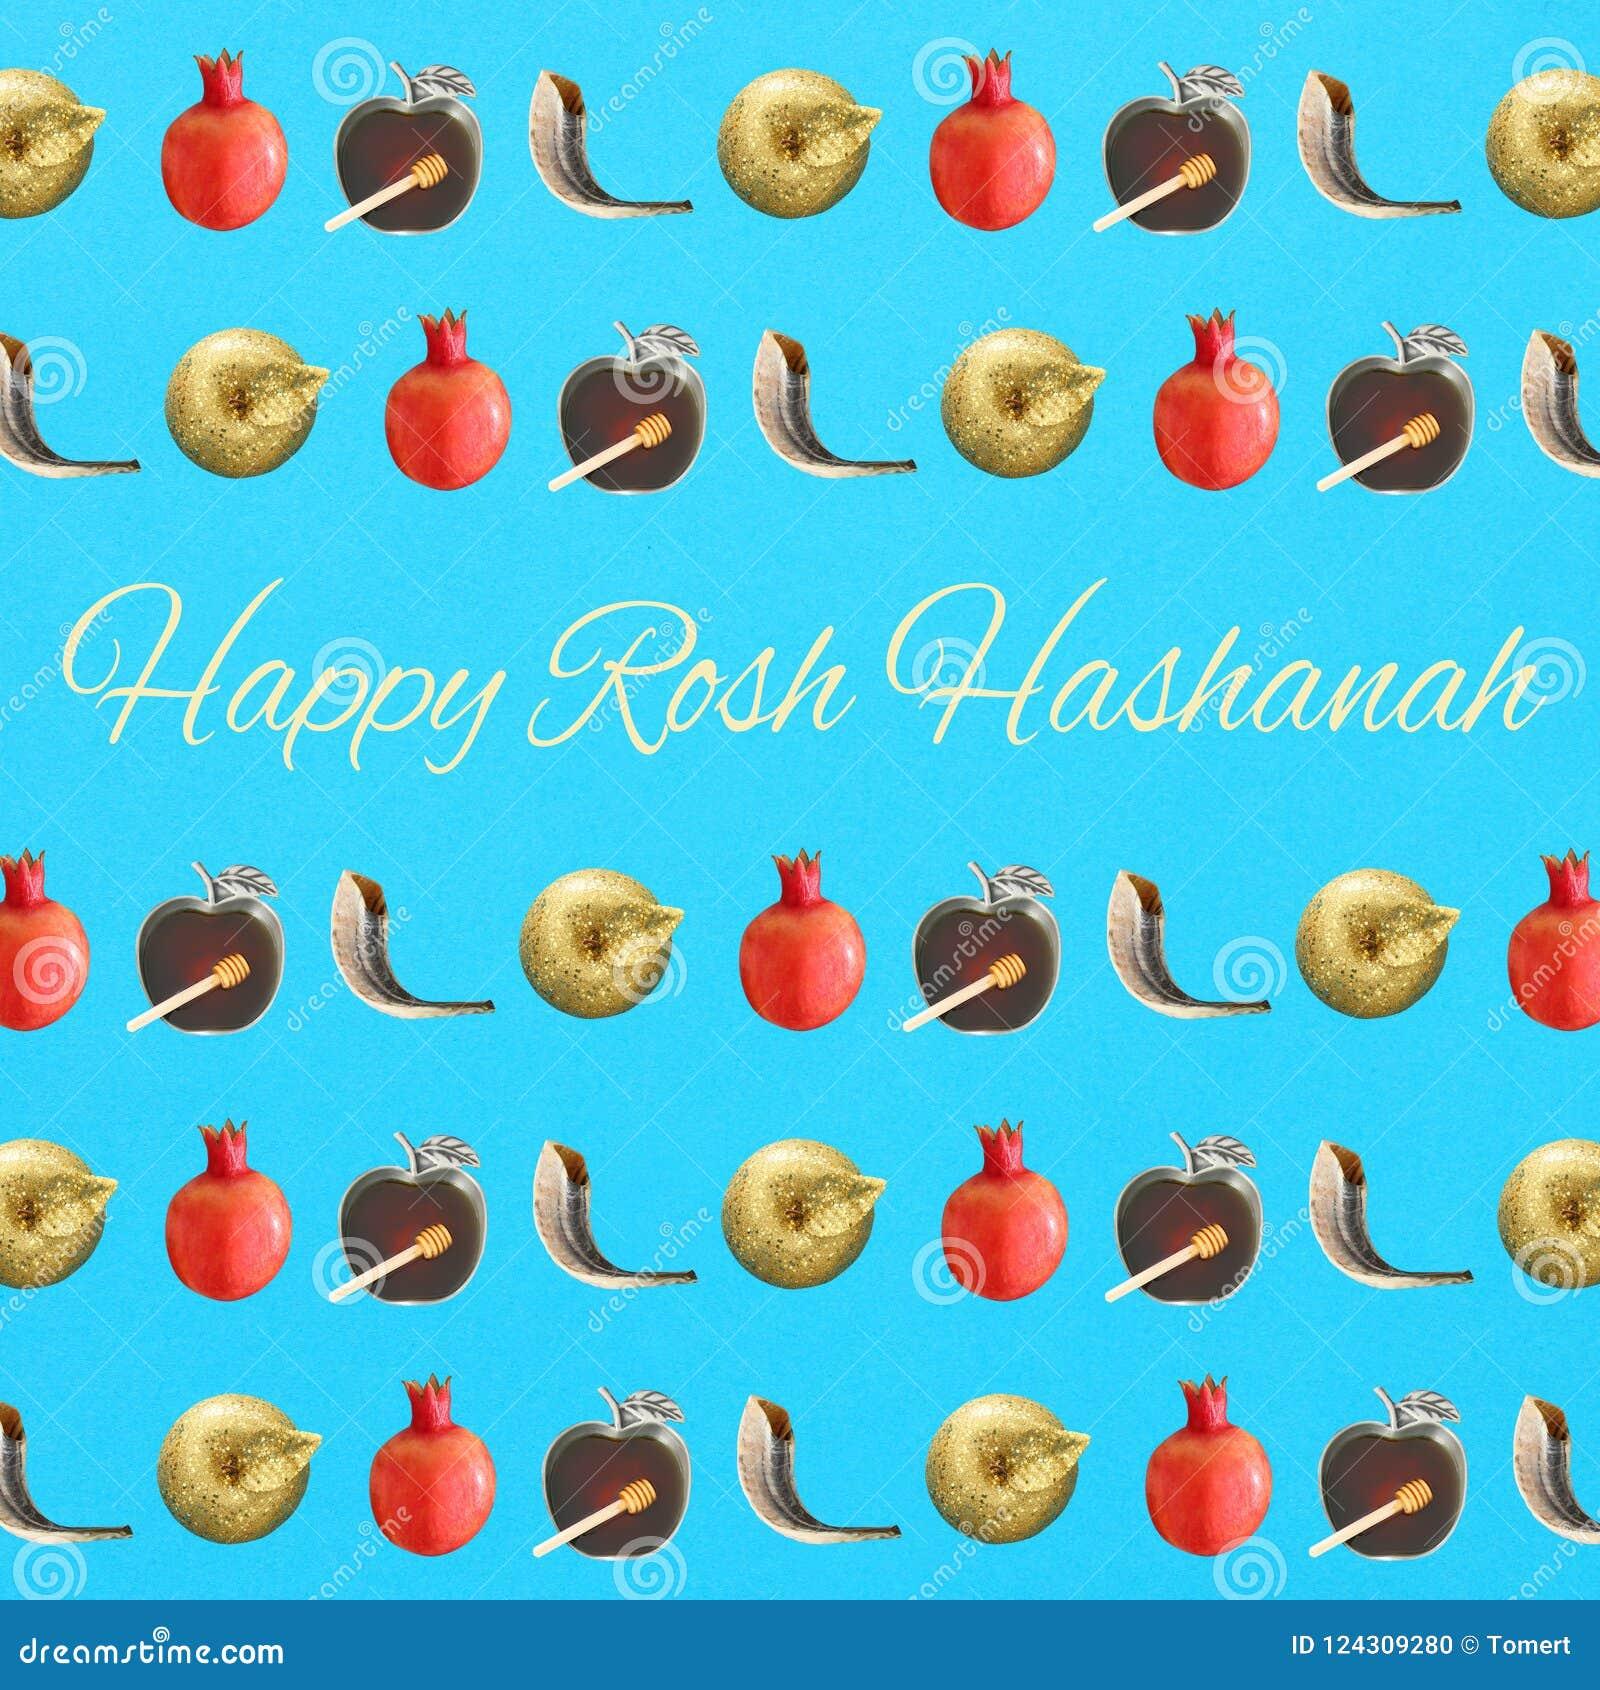 Rosh Hashanah X28jewish New Year Holiday X29 Pattern Concept